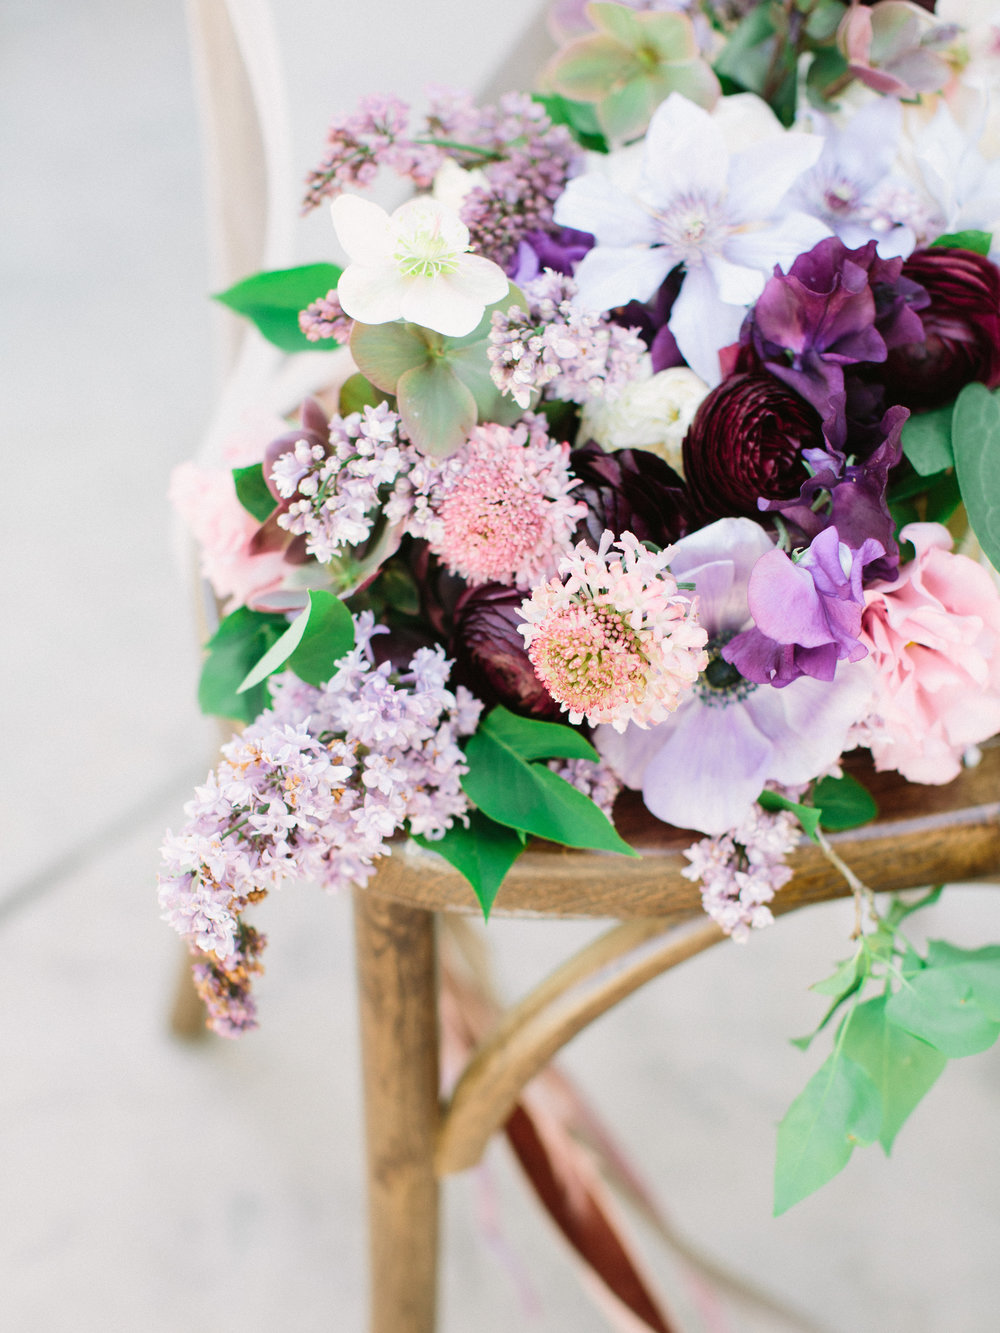 This-Love-of-Yours-Kirigin-Cellars-Flower-Arch-Styled-Shoot-041.jpg